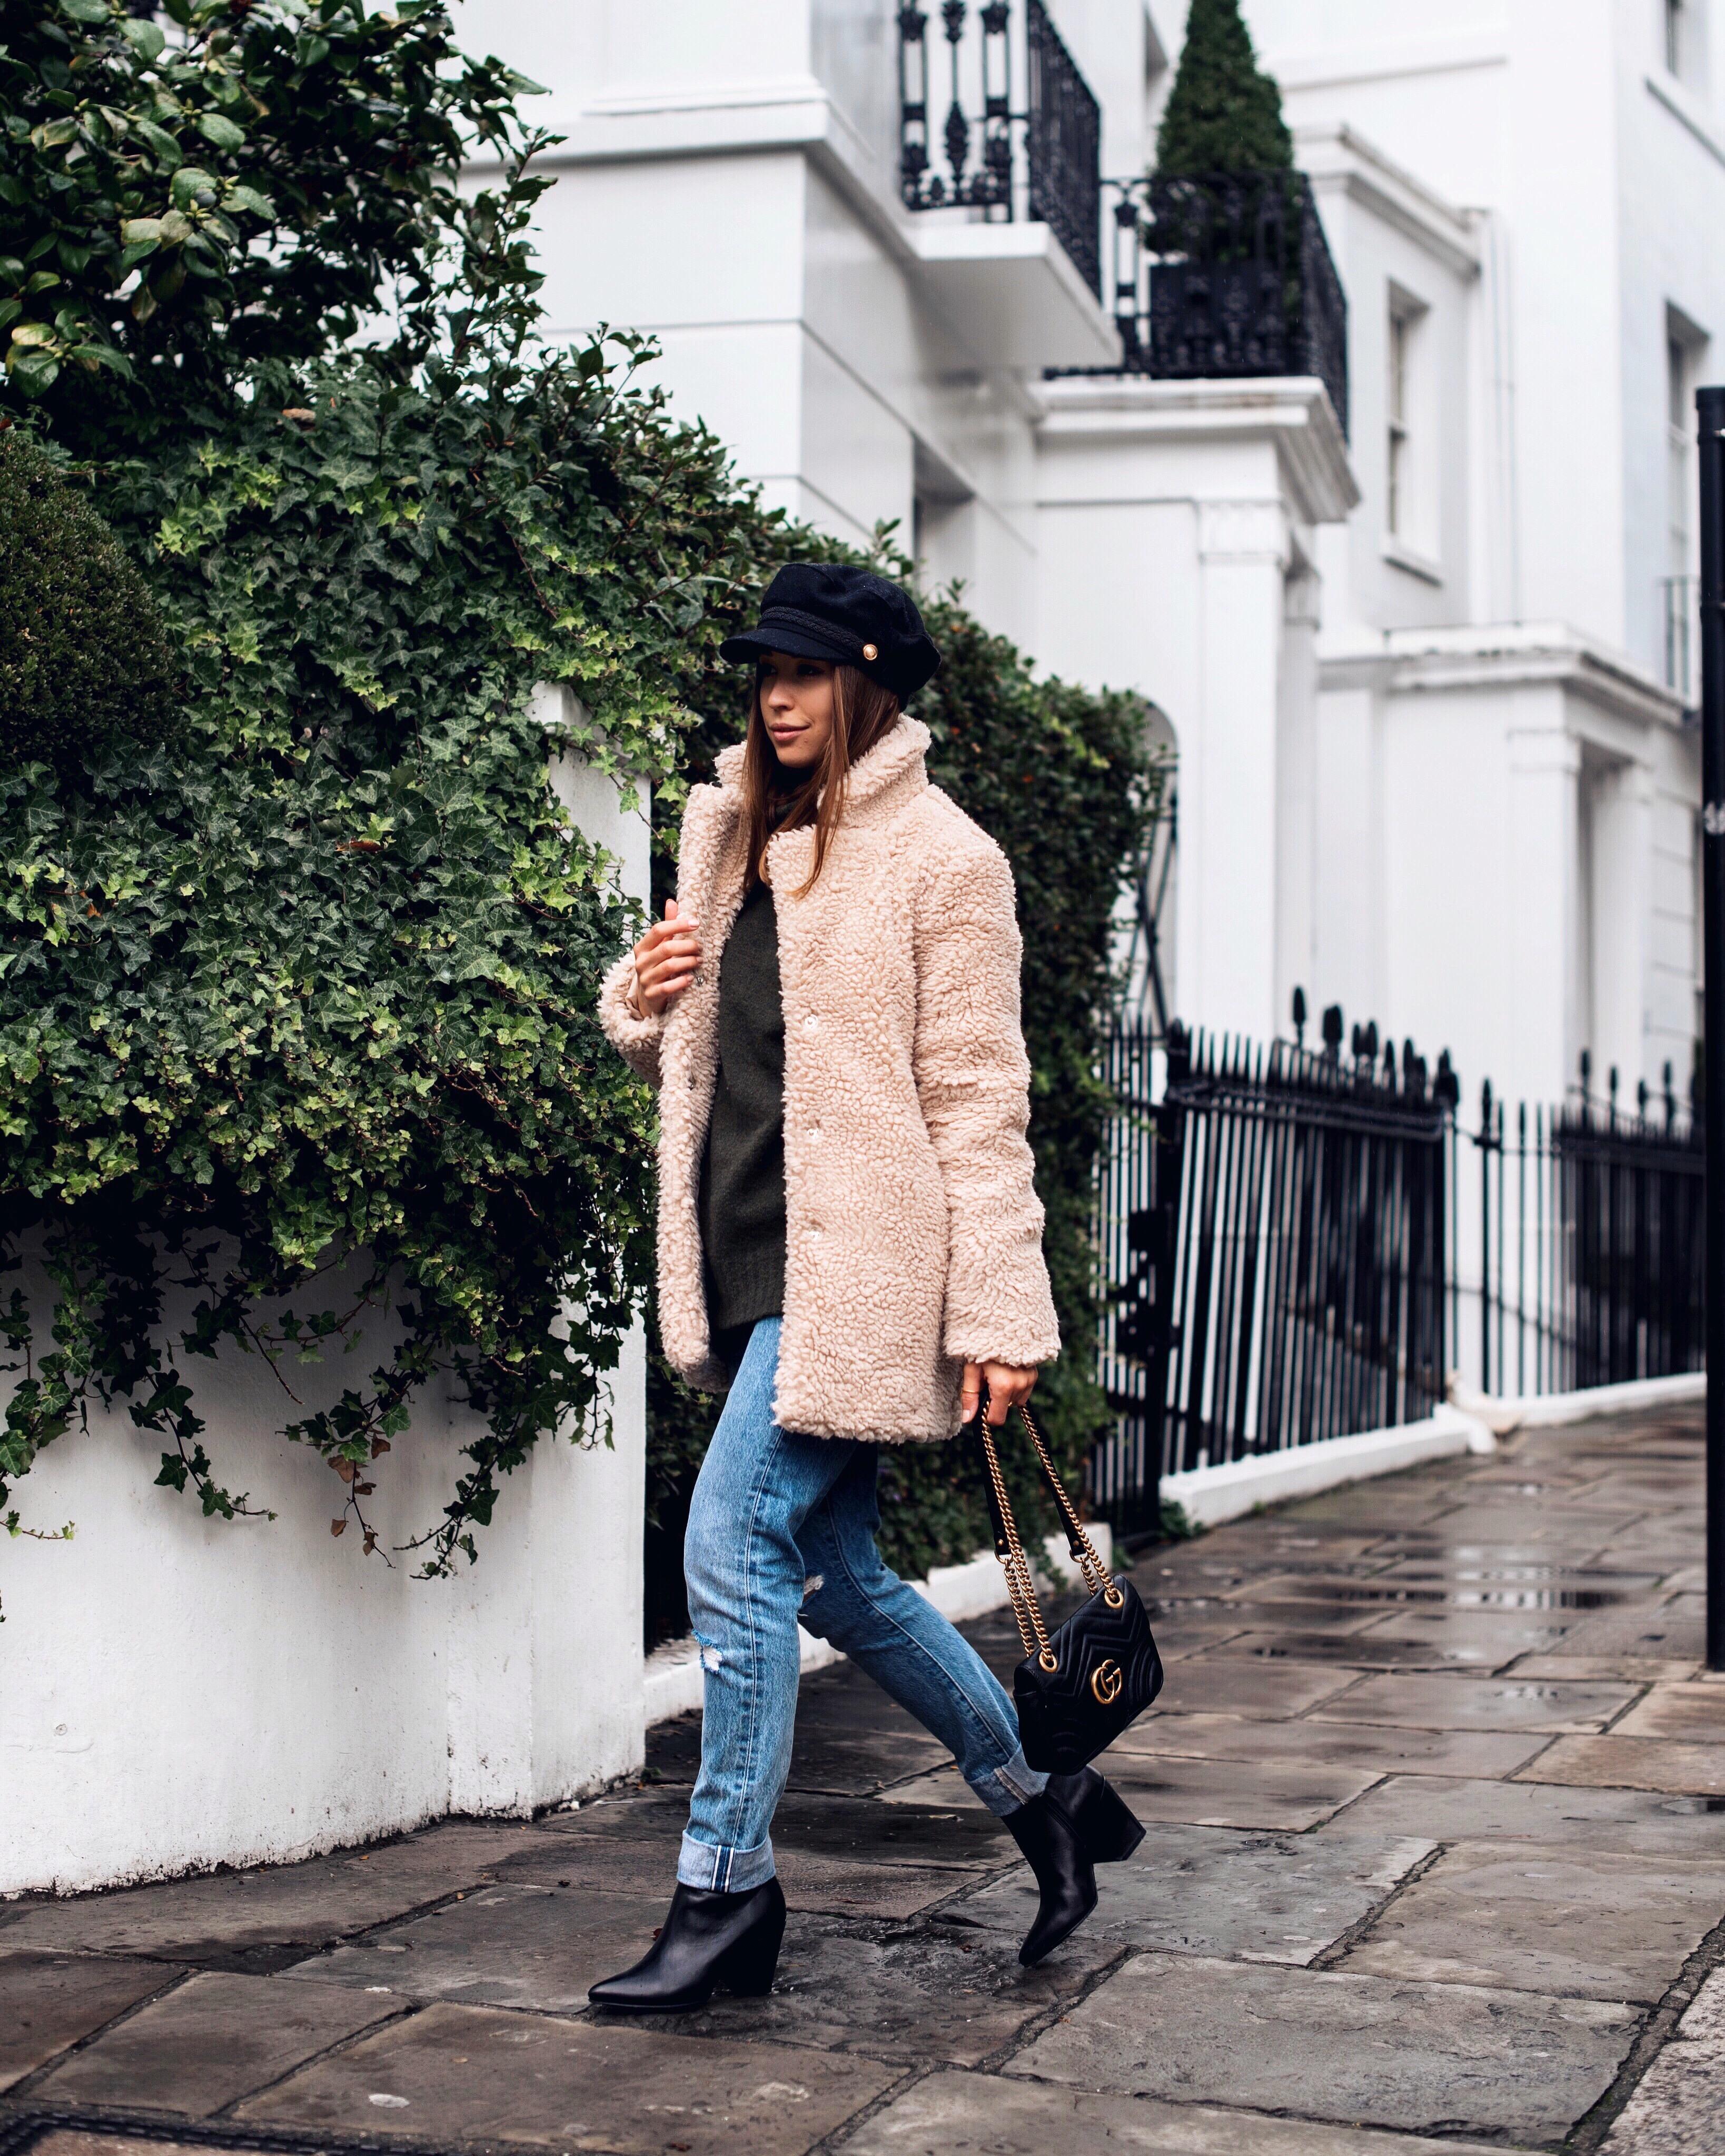 teddy-coat-outfit-teddy-coats-kombinieren-stylemocca